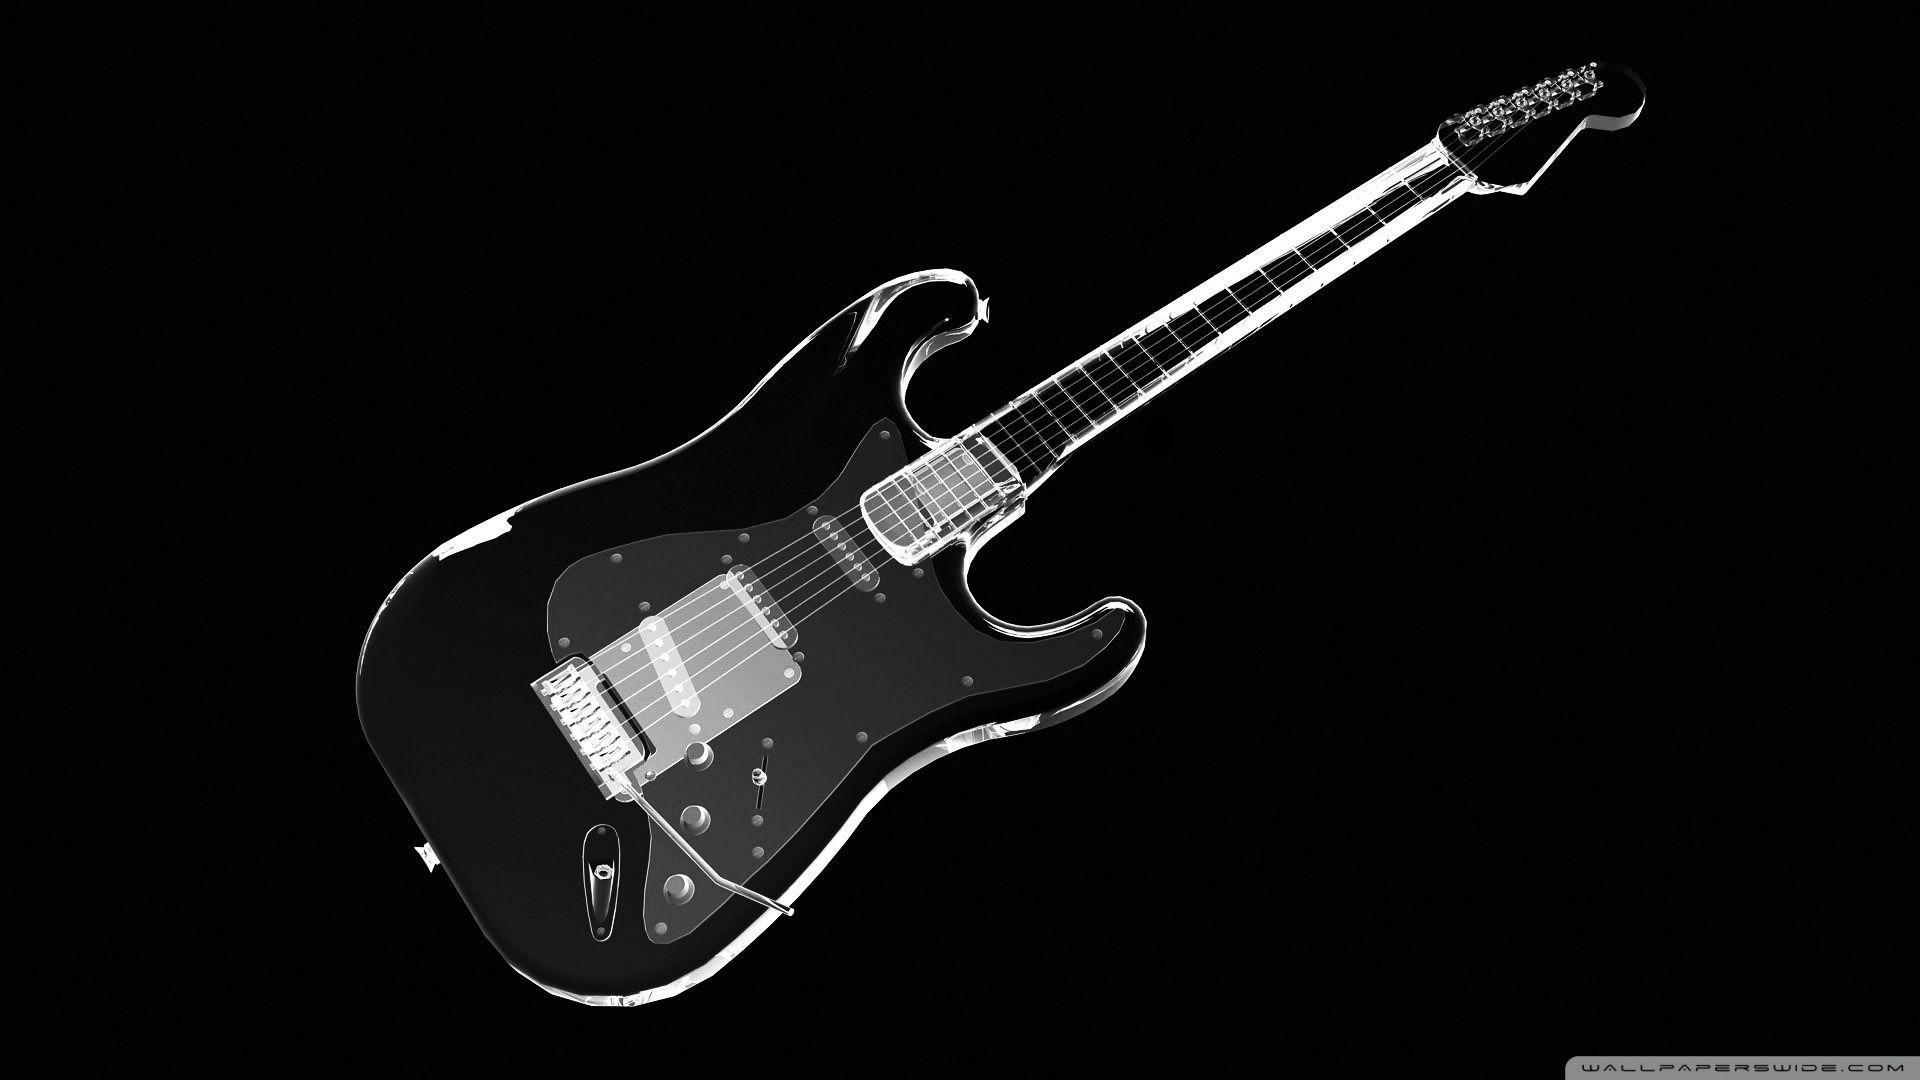 Guitar Wallpapers 3d Wallpaper Cave